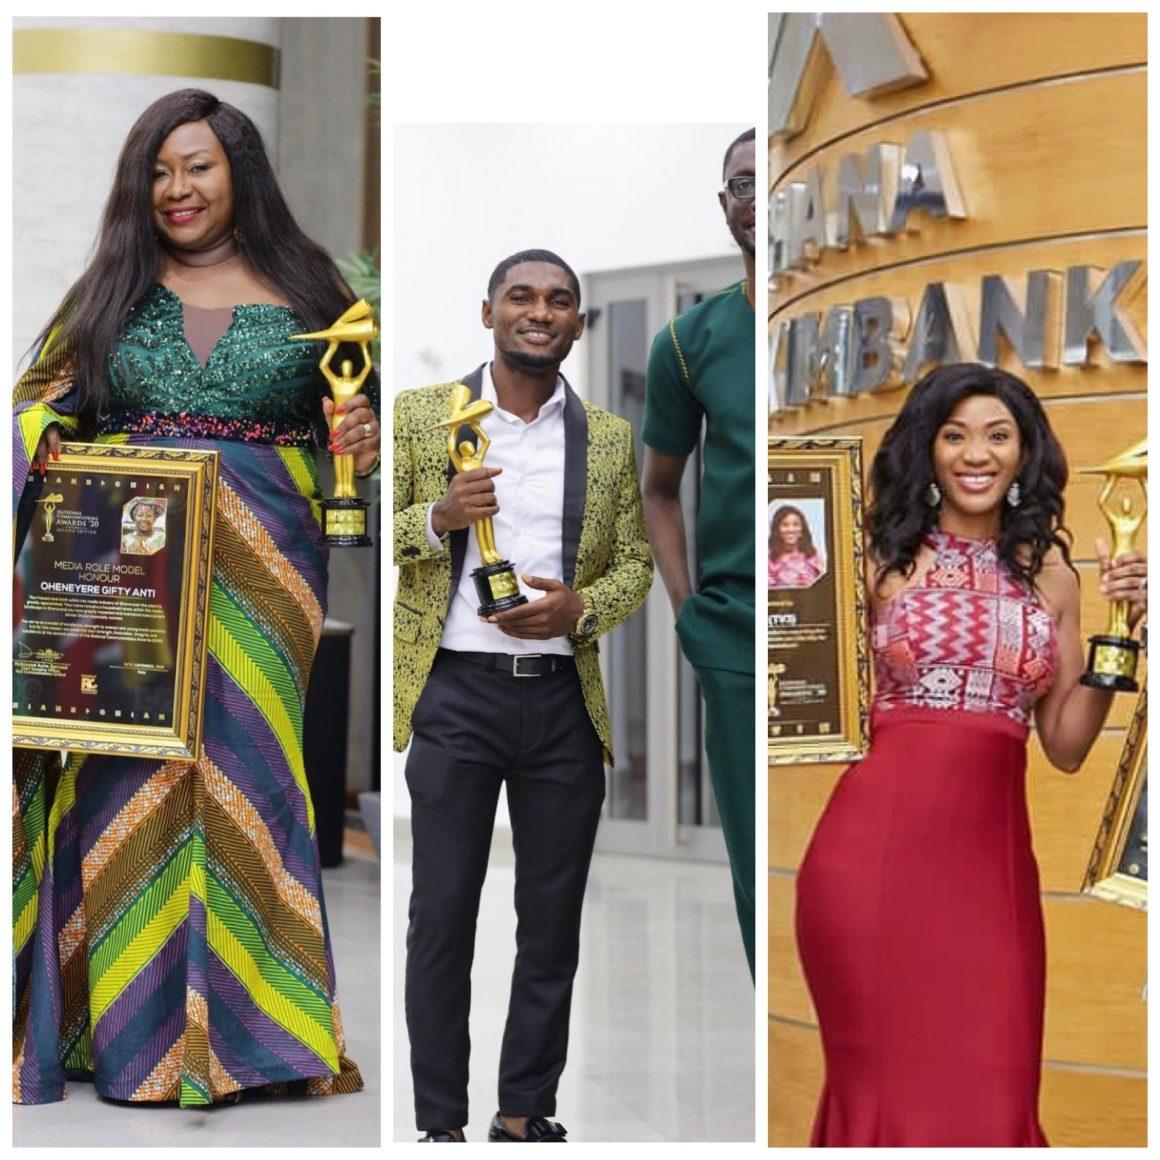 gifty-anti,-portia-gabor,-gh-kwaku-and-teacher-kwadwo-win-big-at-national-communications-awards-2020